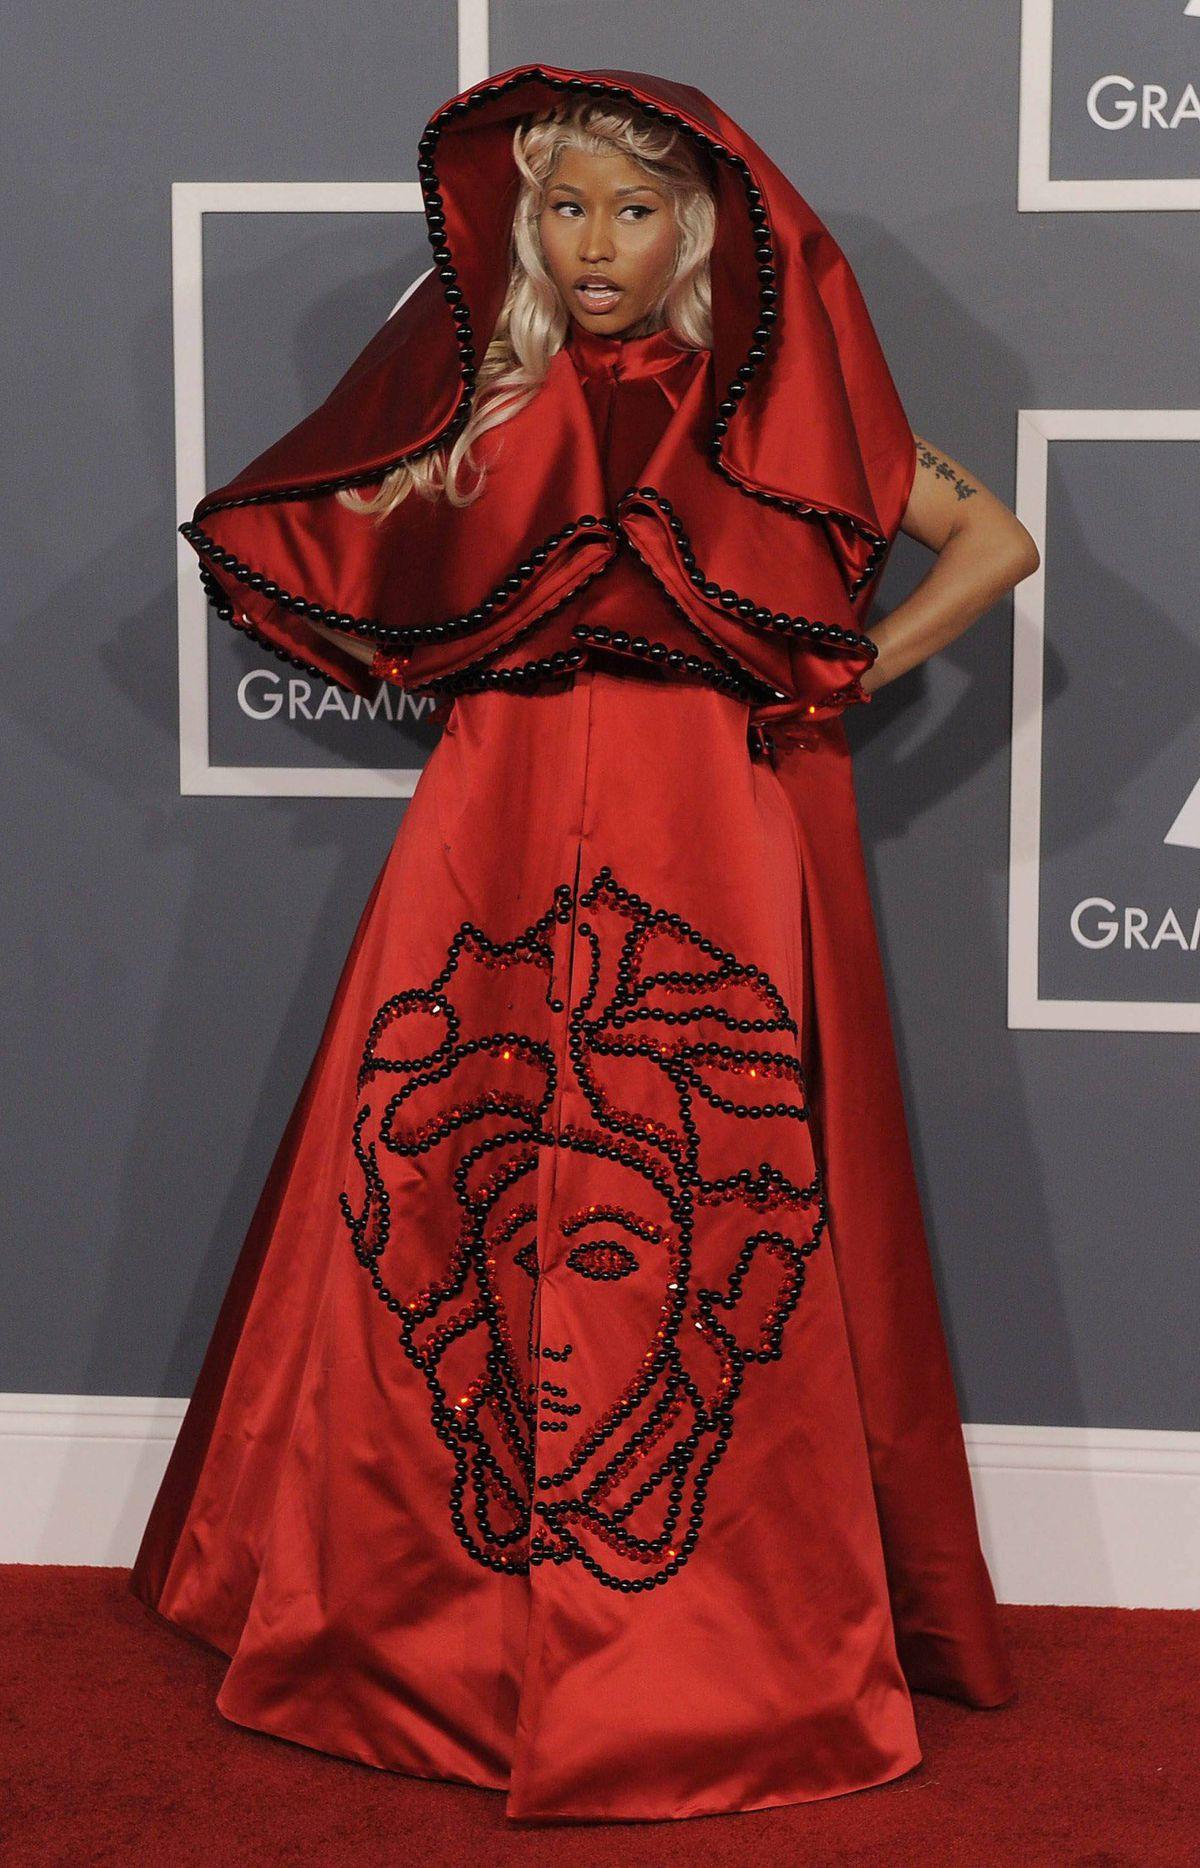 Nicki Minaj arrives at the 54th annual Grammy Awards on Sunday, Feb. 12, 2012 in Los Angeles.